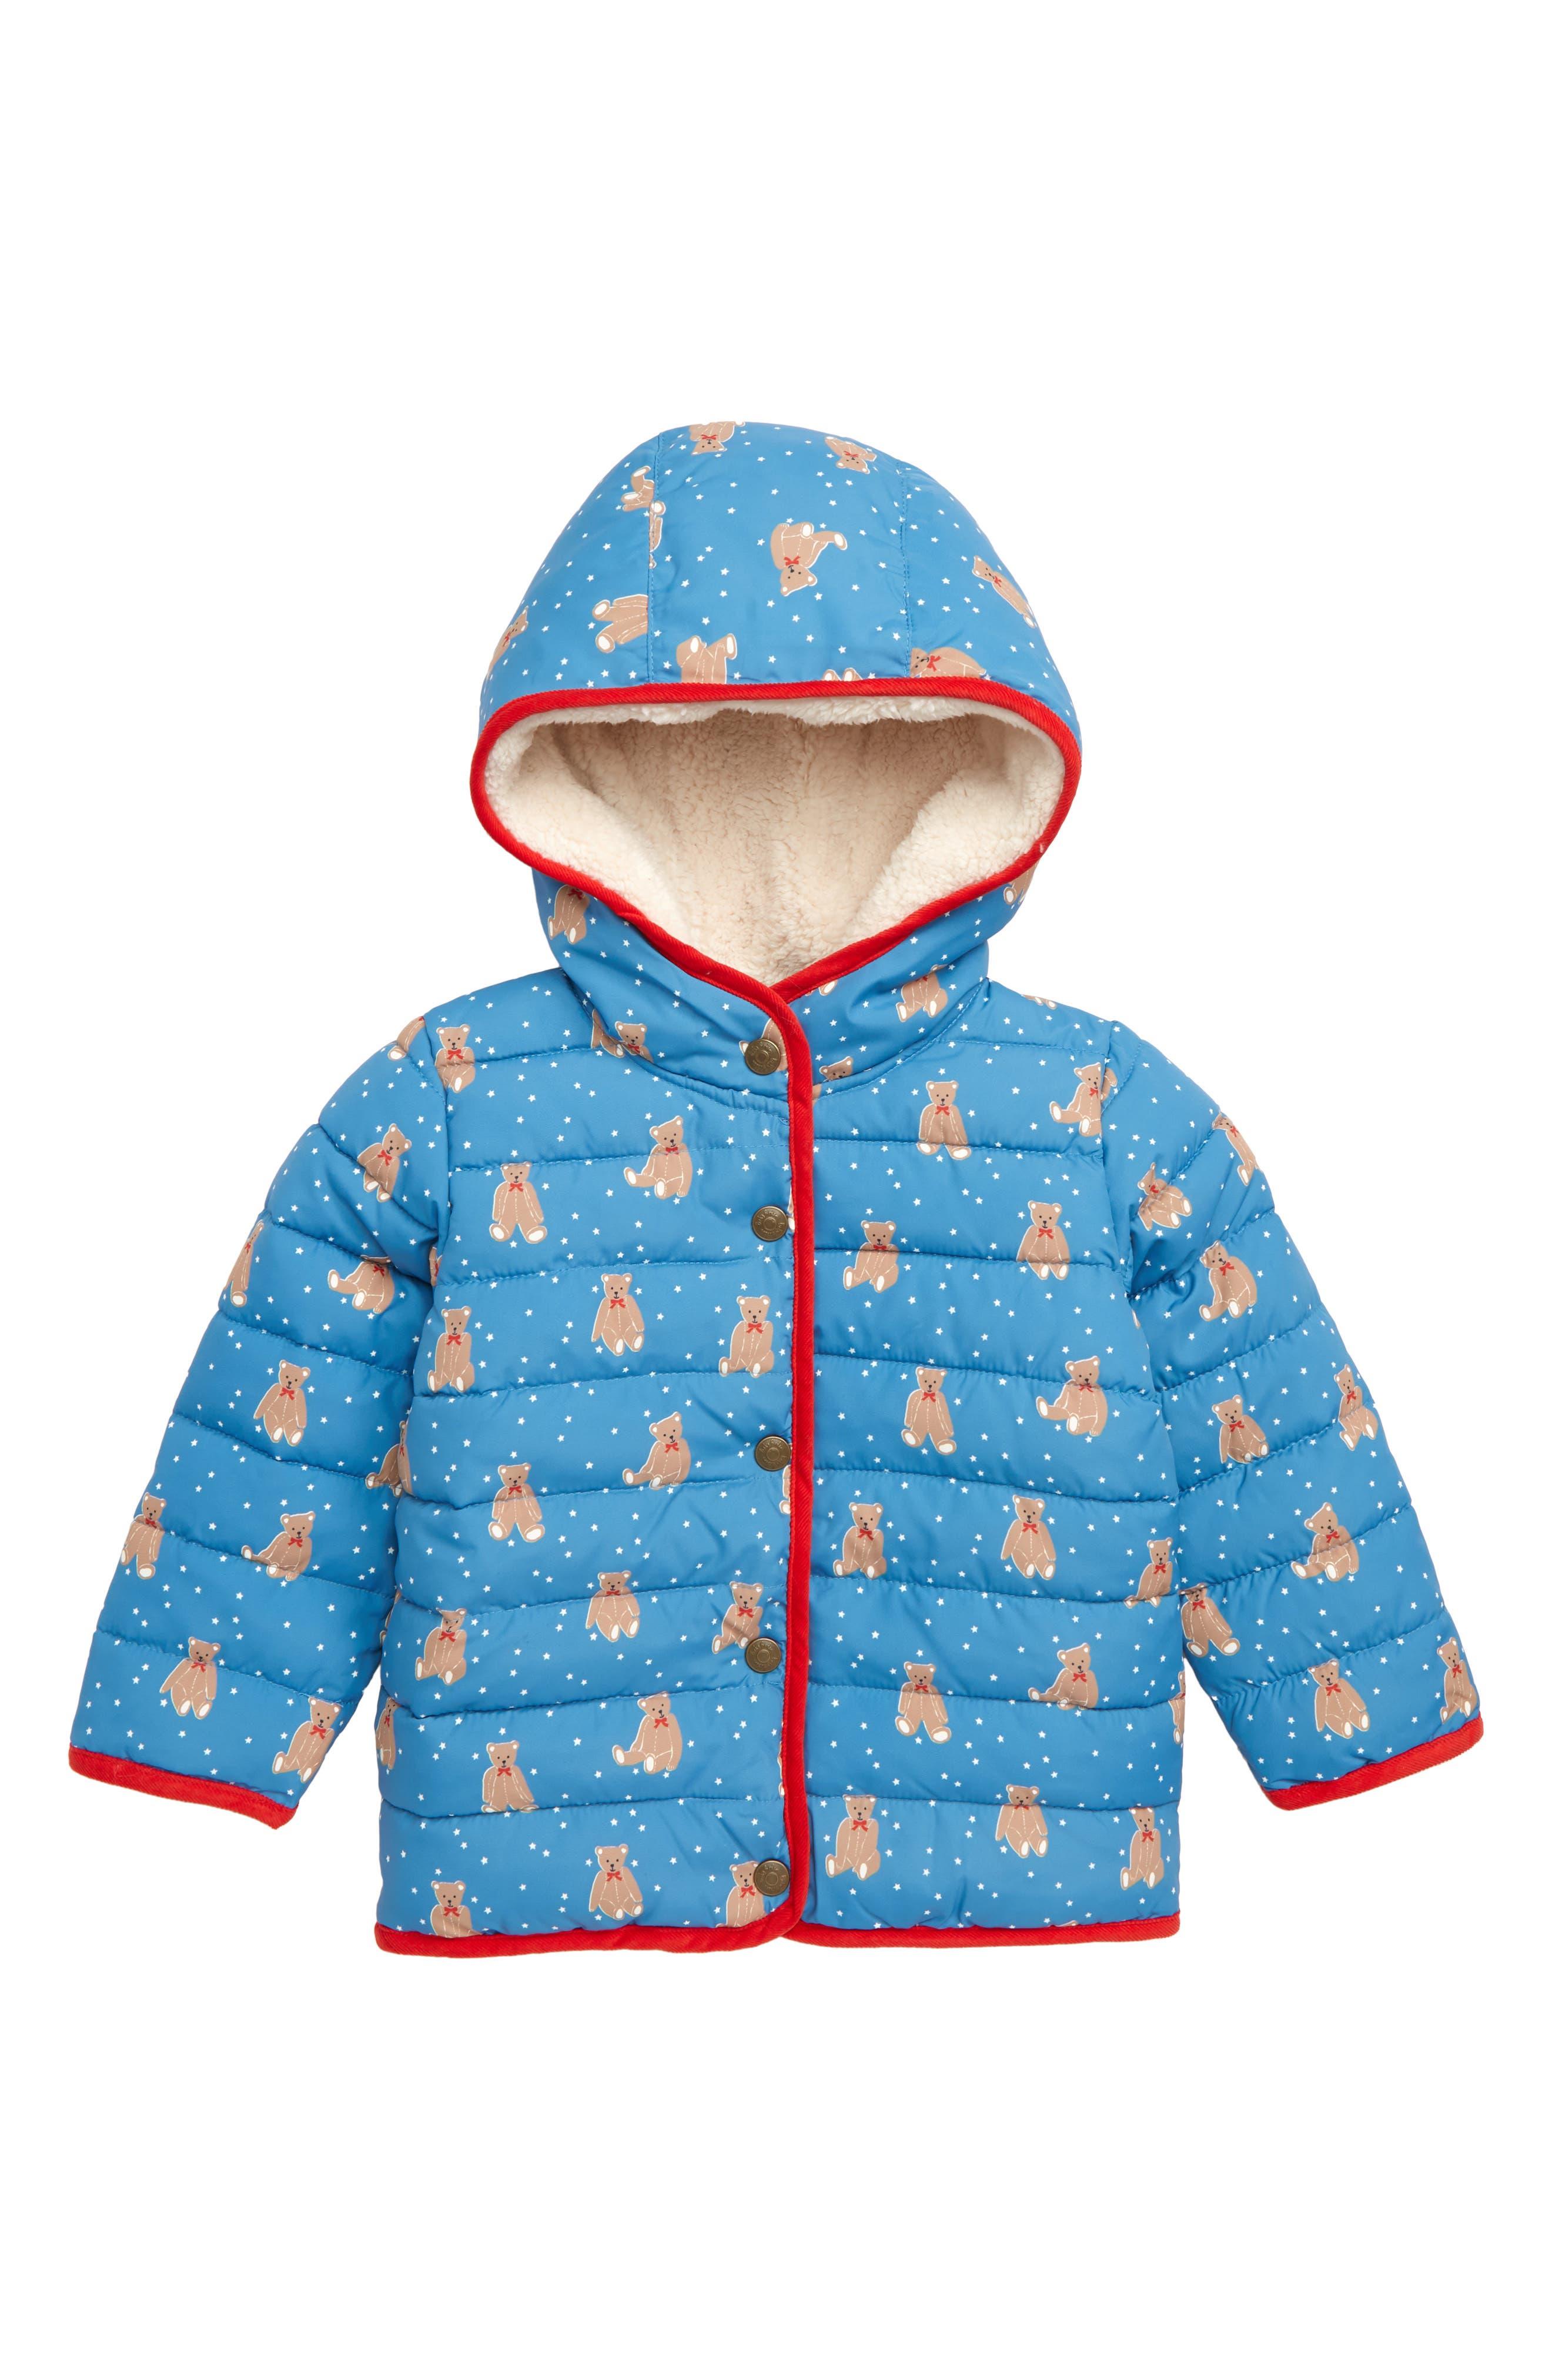 5ee5aafe84f7 Mini Boden Kids  Coats   Outerwear Clothing